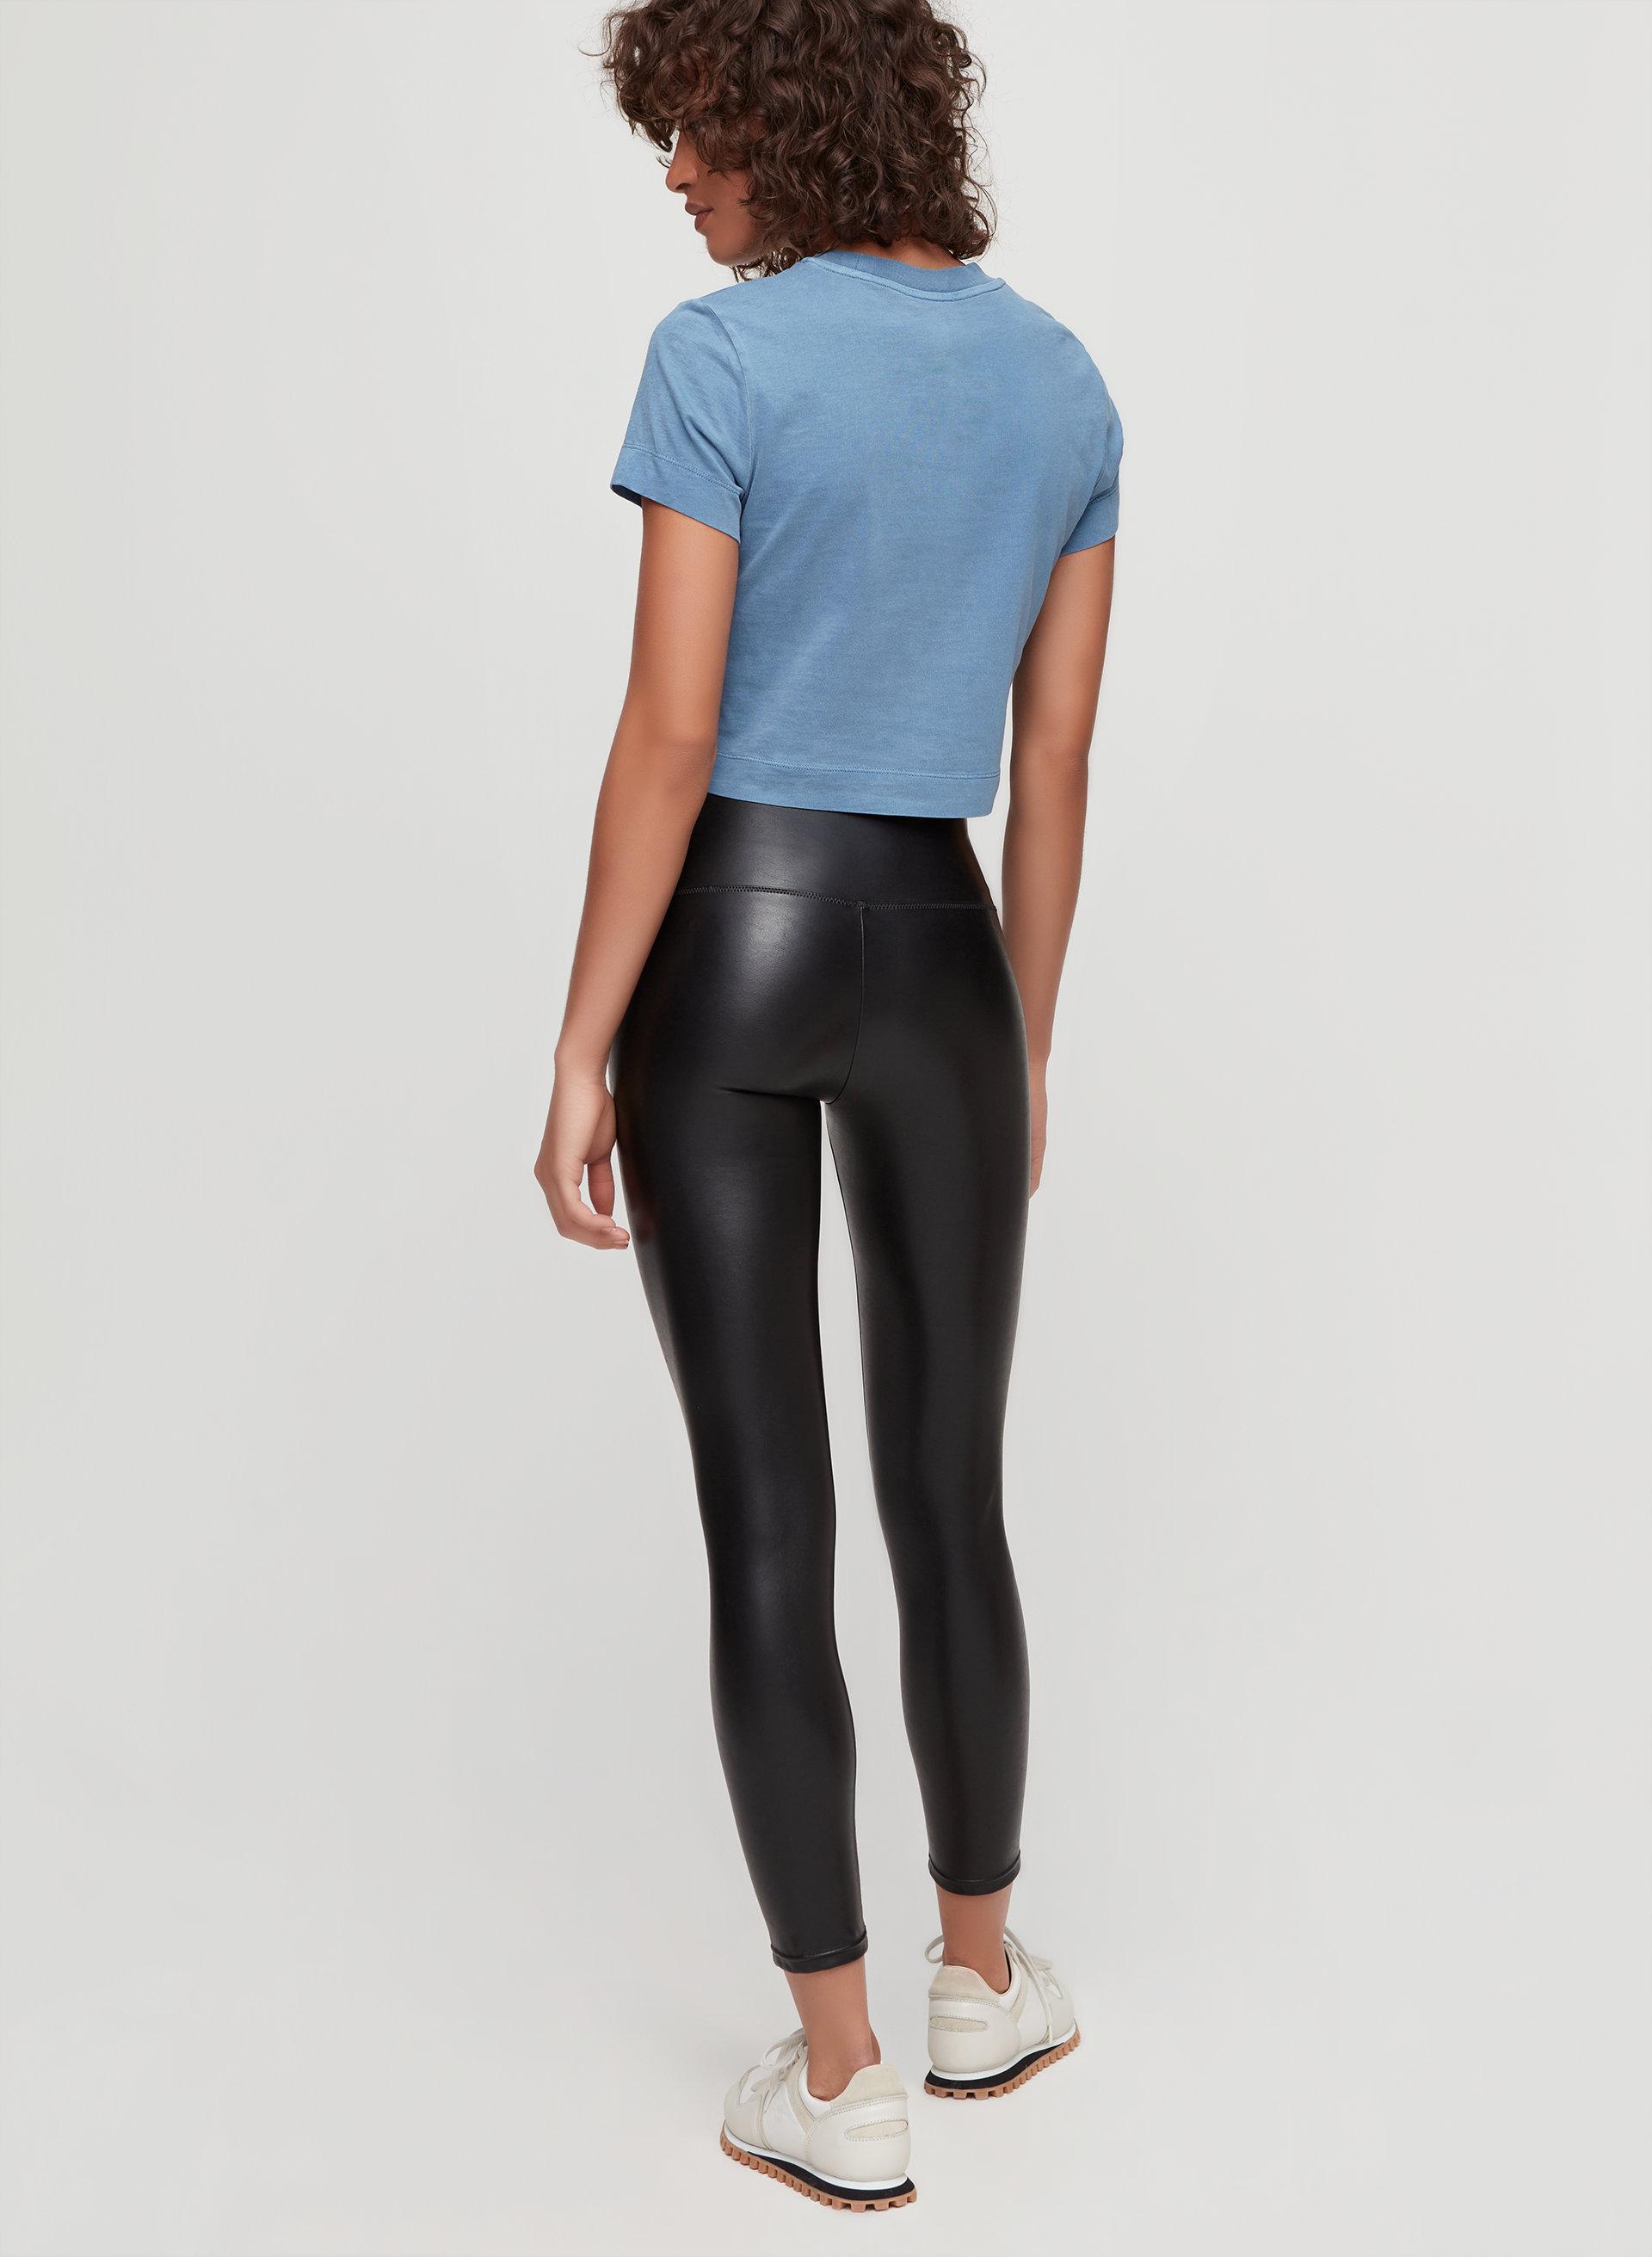 22d062e3a8351c DARIA ANKLE PANT - Cropped, faux-leather legging